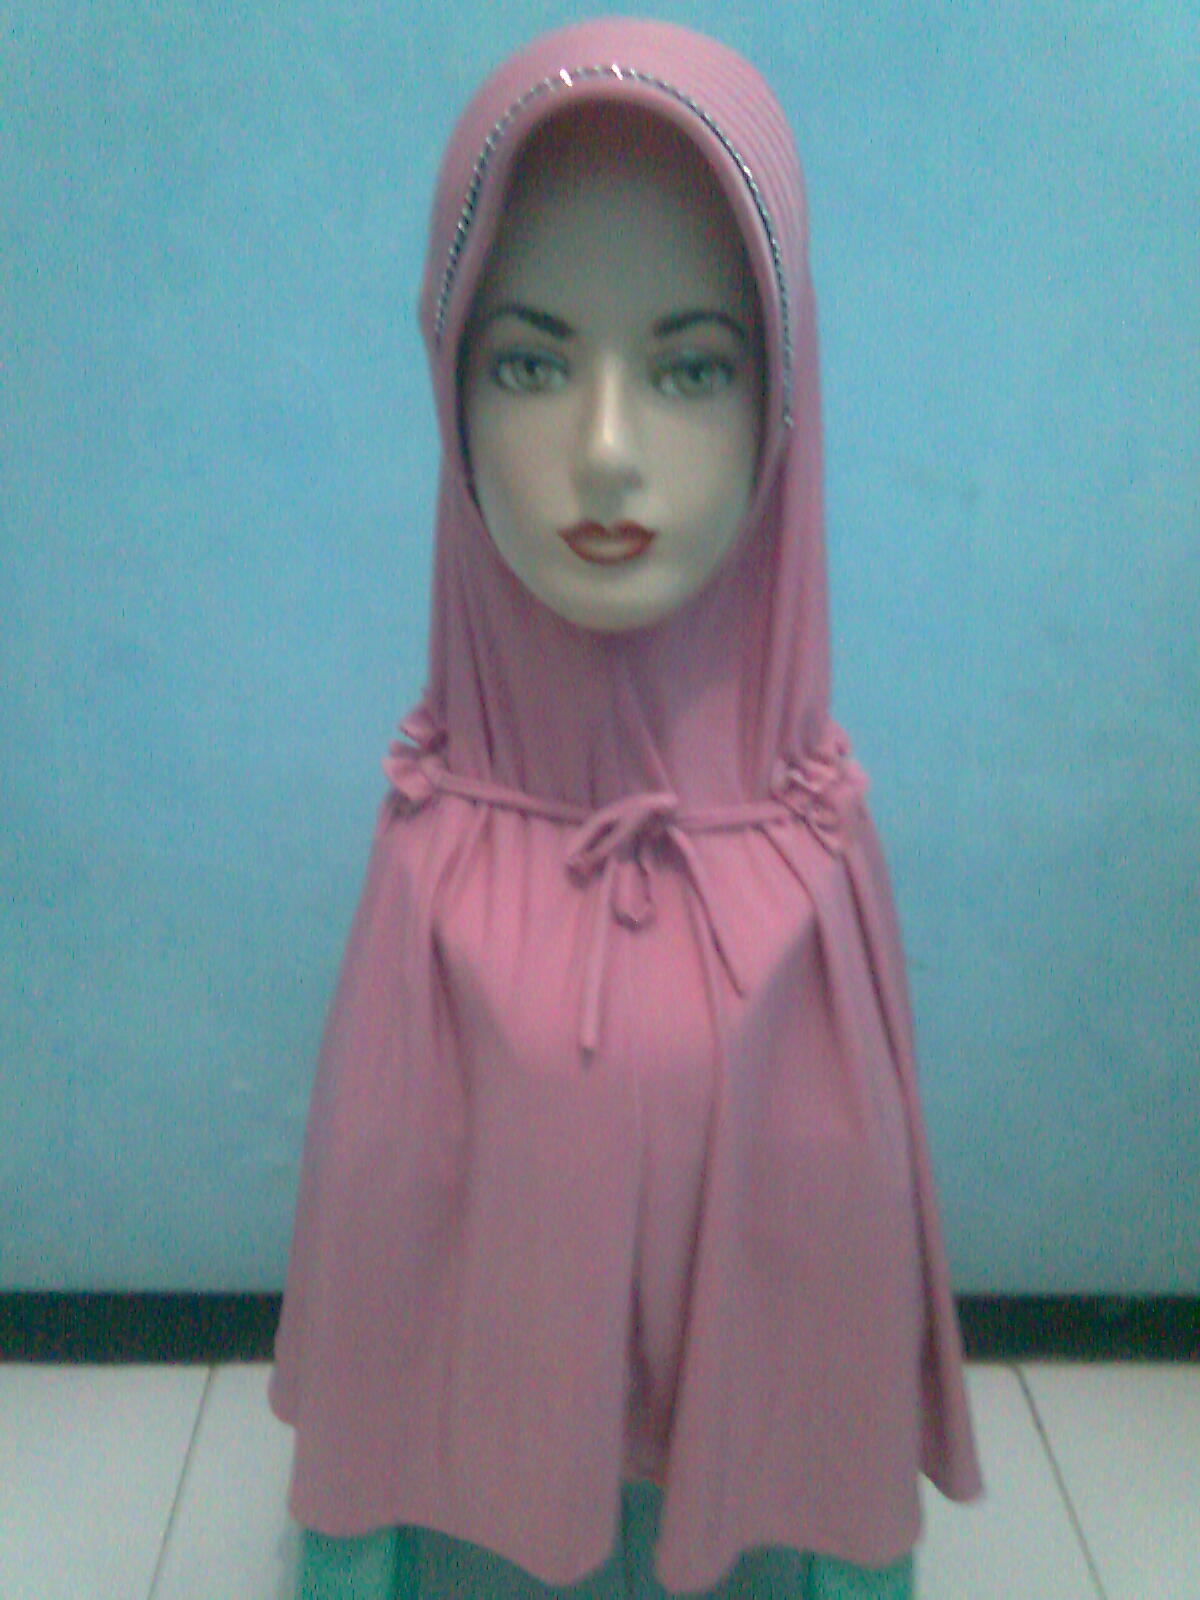 Jual Jilbab Rabbani Online - Hijab Nemo